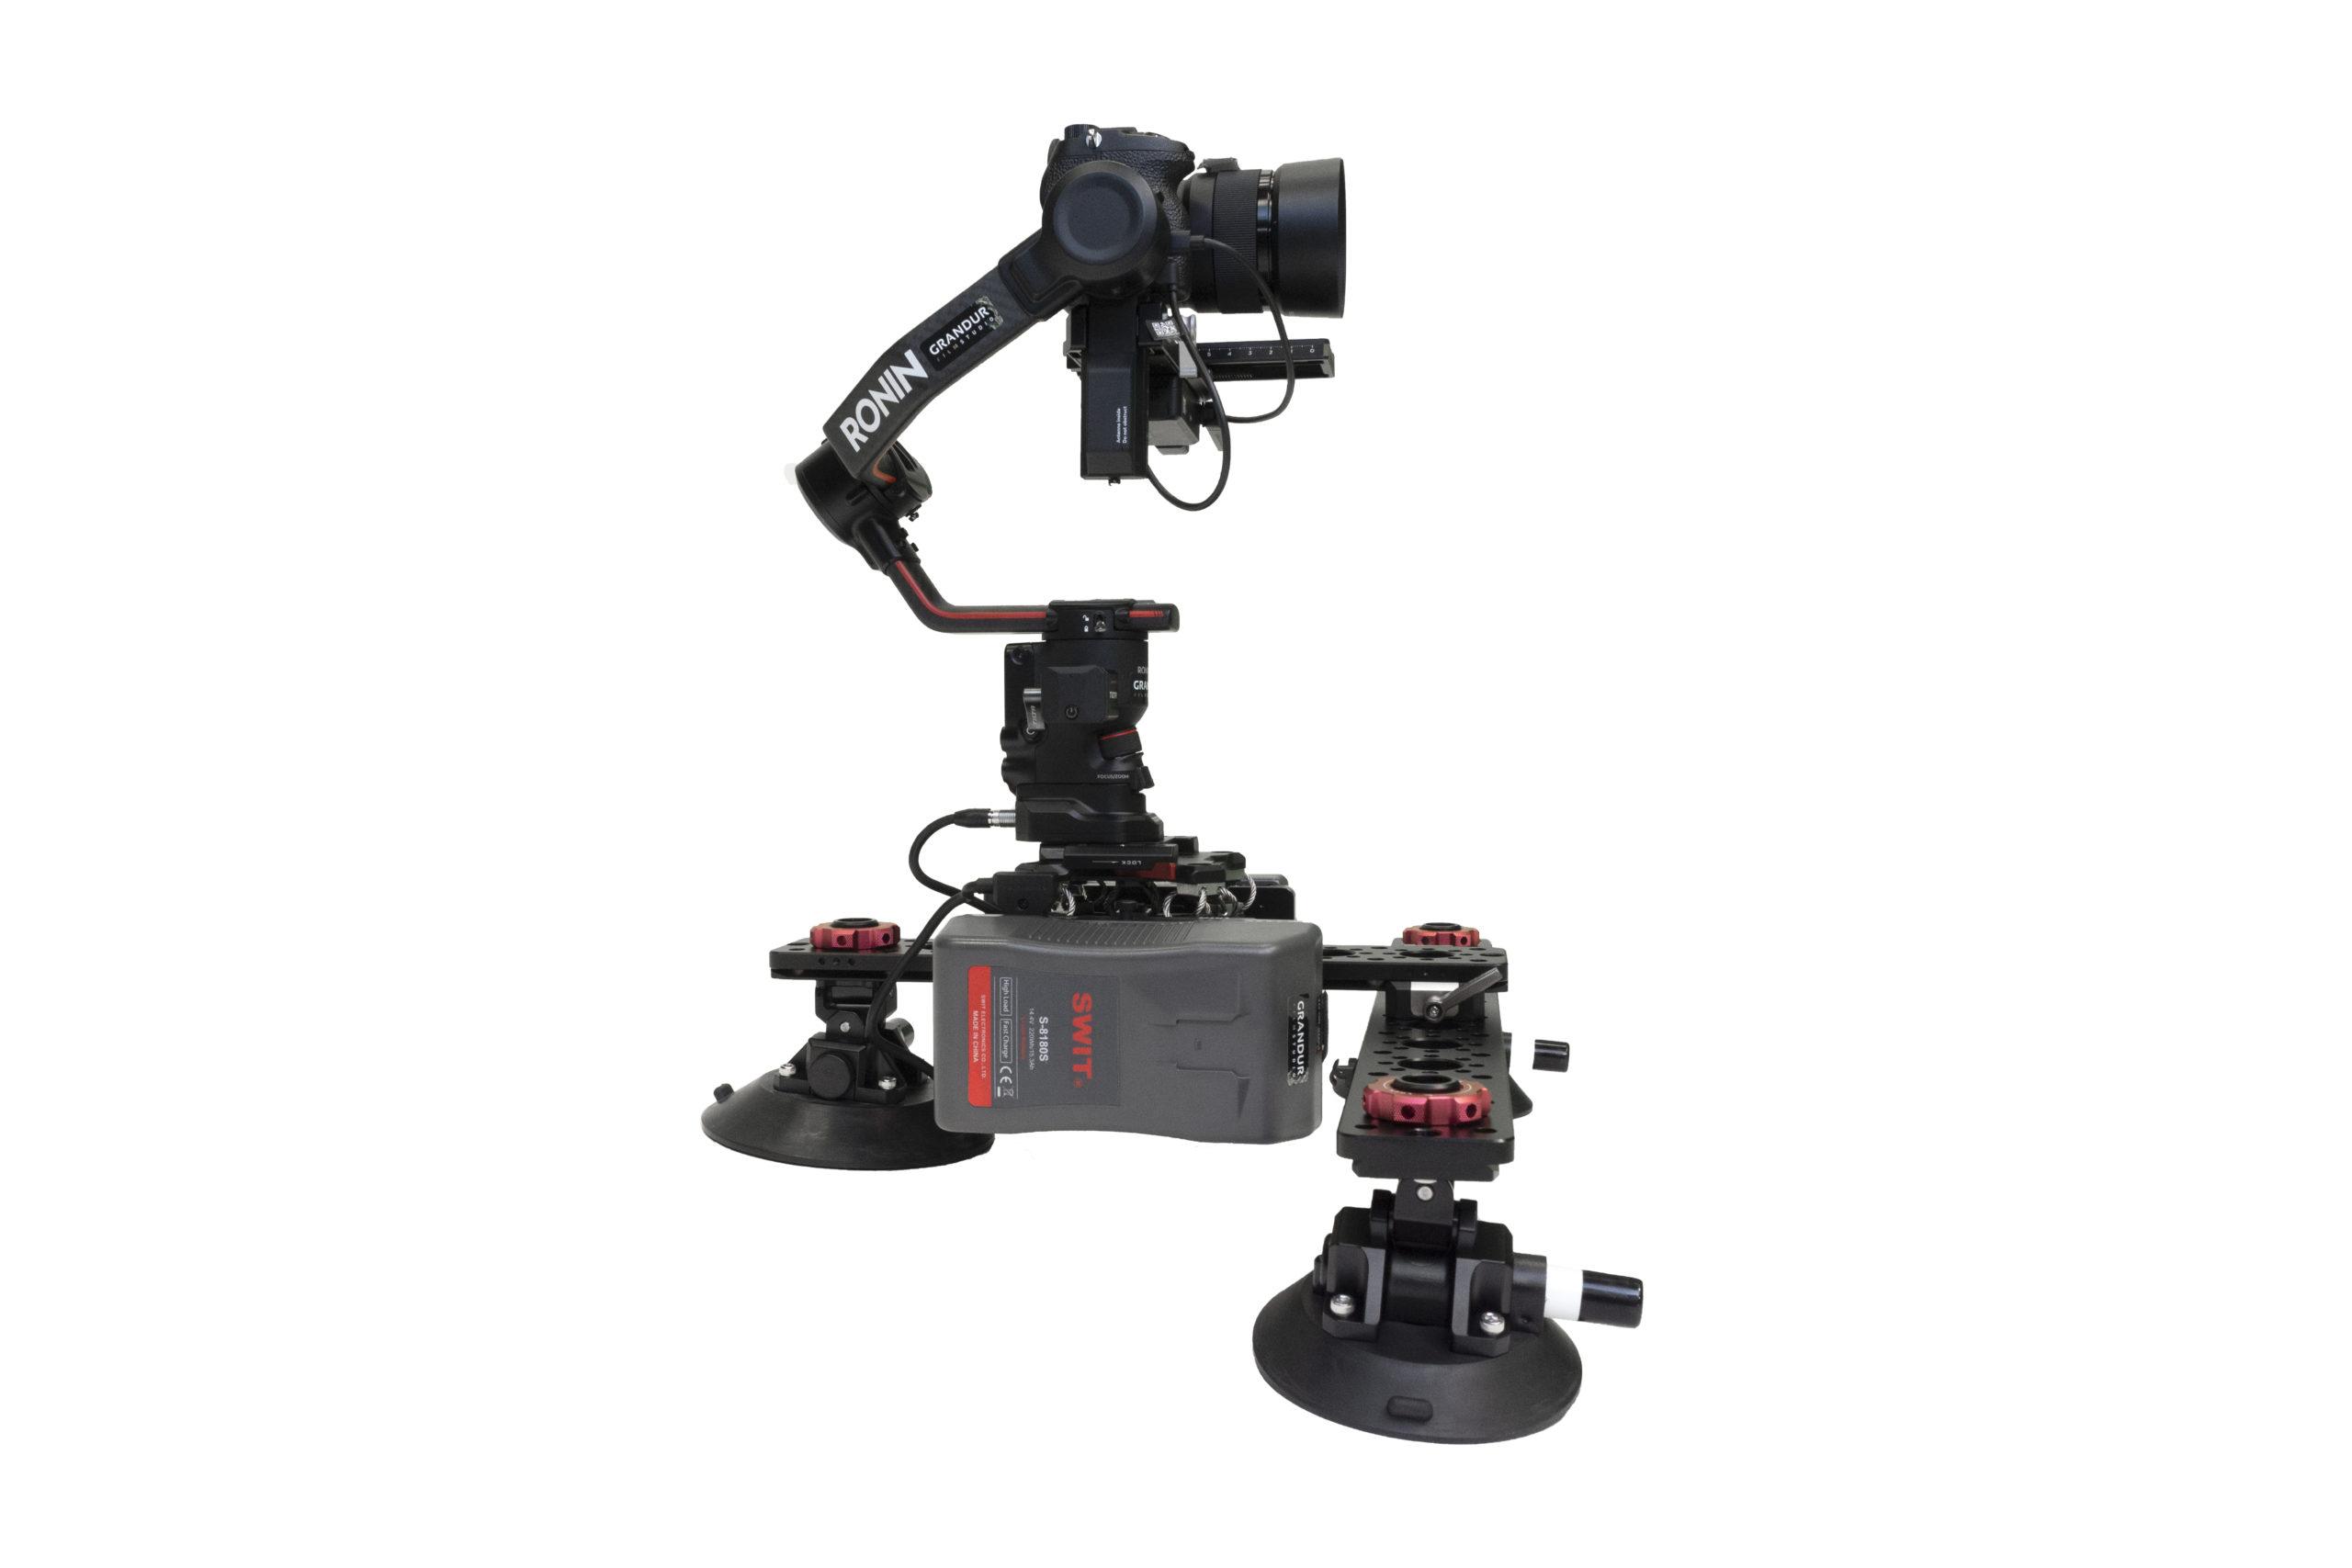 Tilta-alien arm-set up